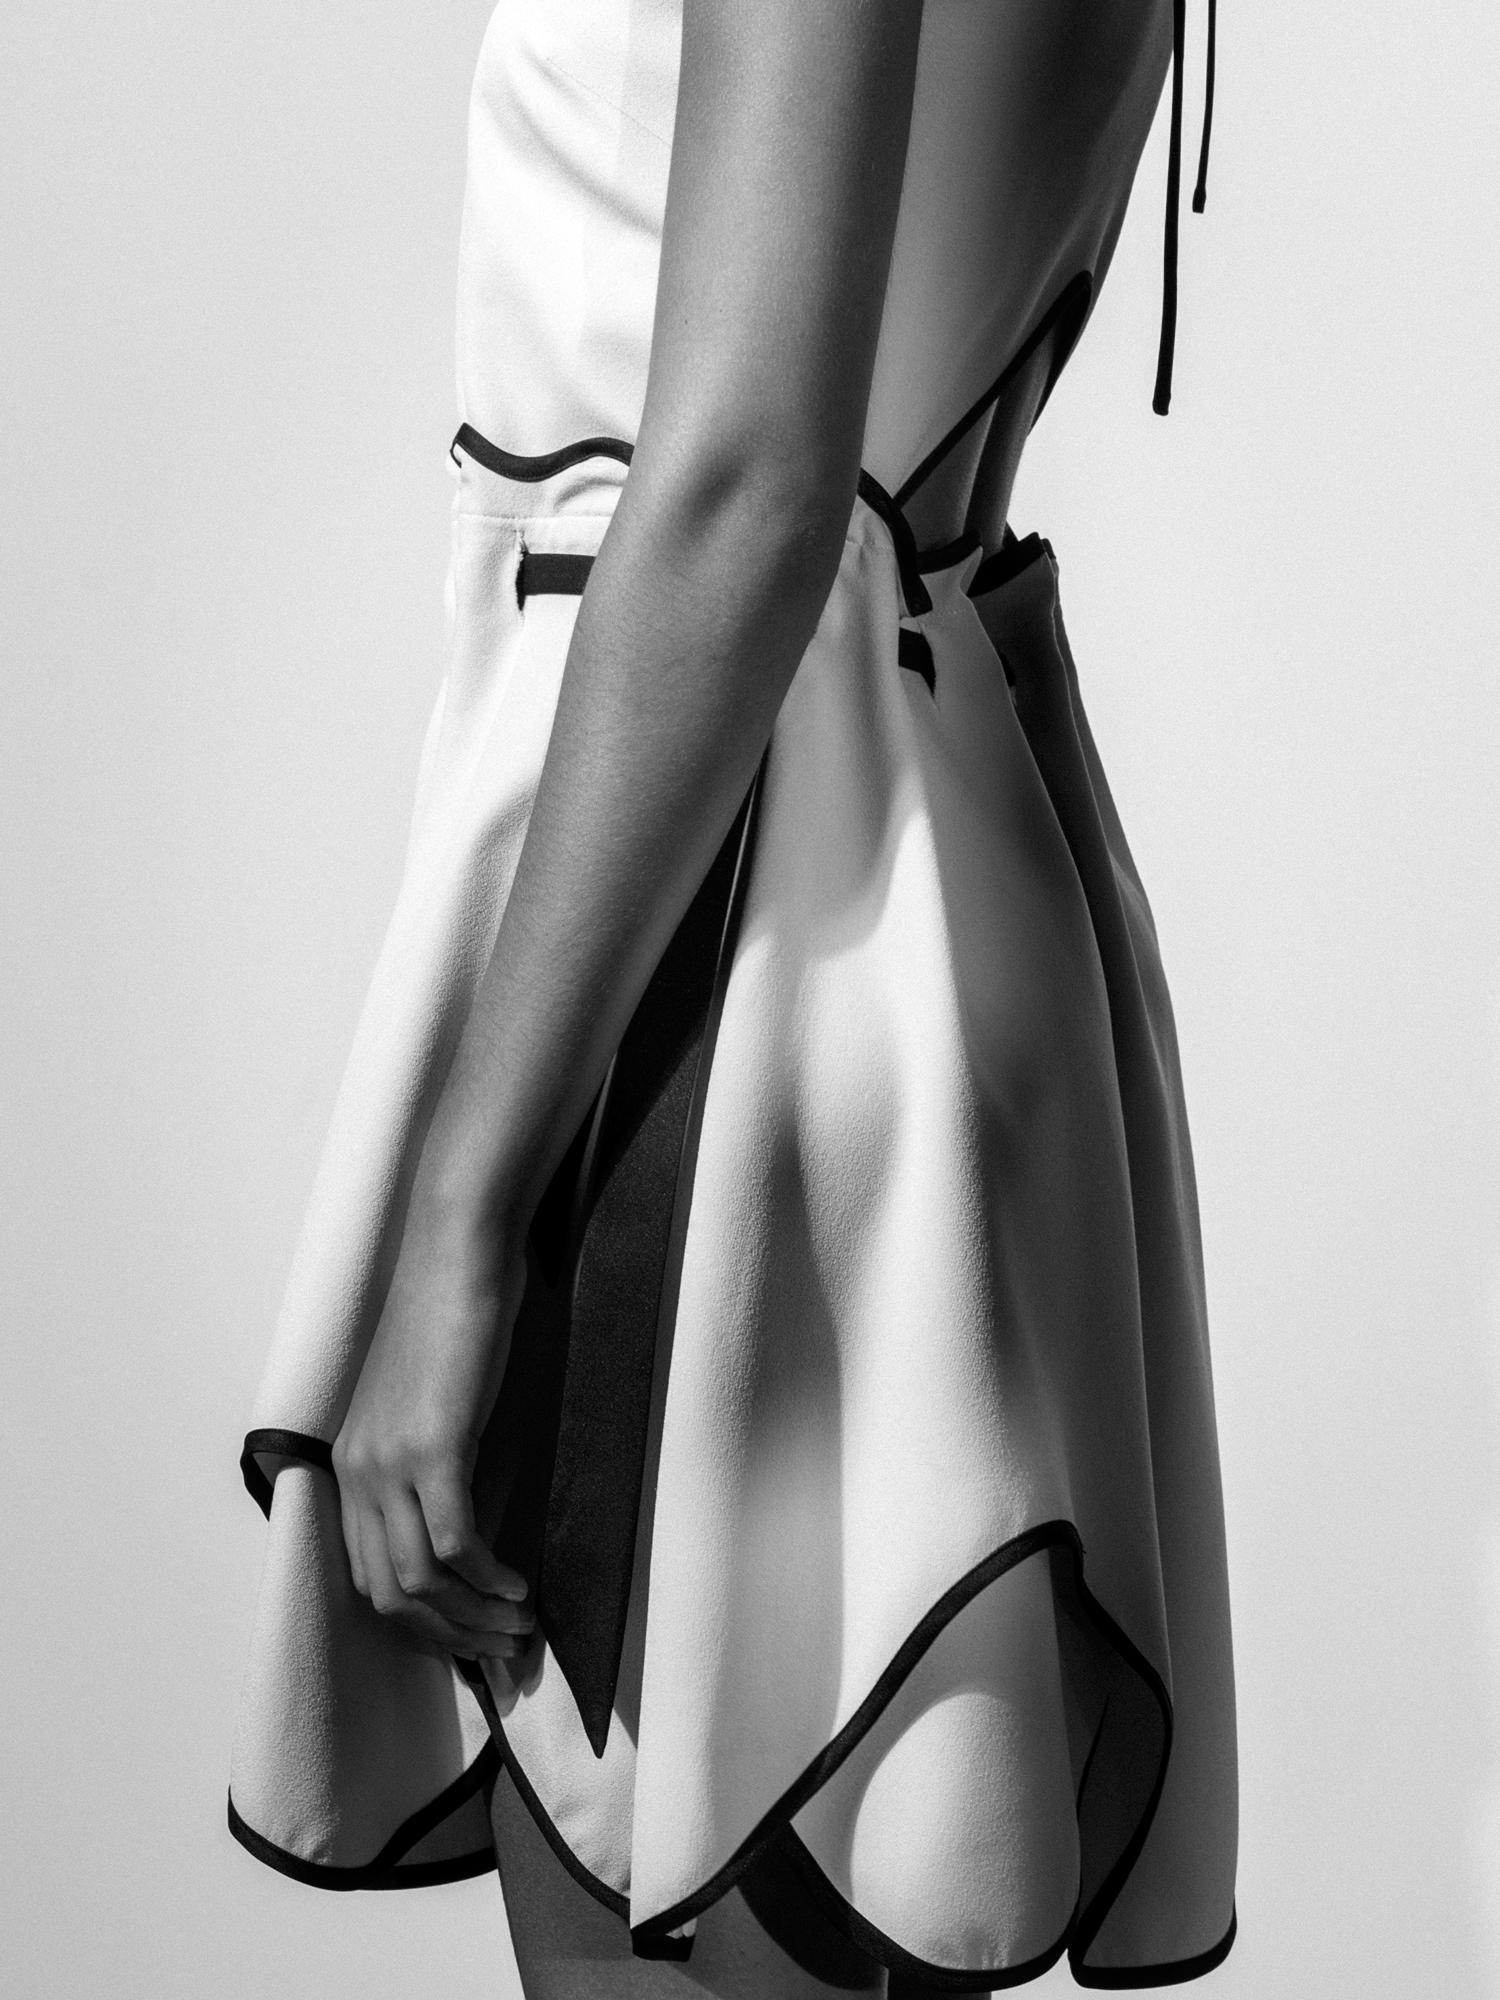 AstredPerez_dressprofile.jpg